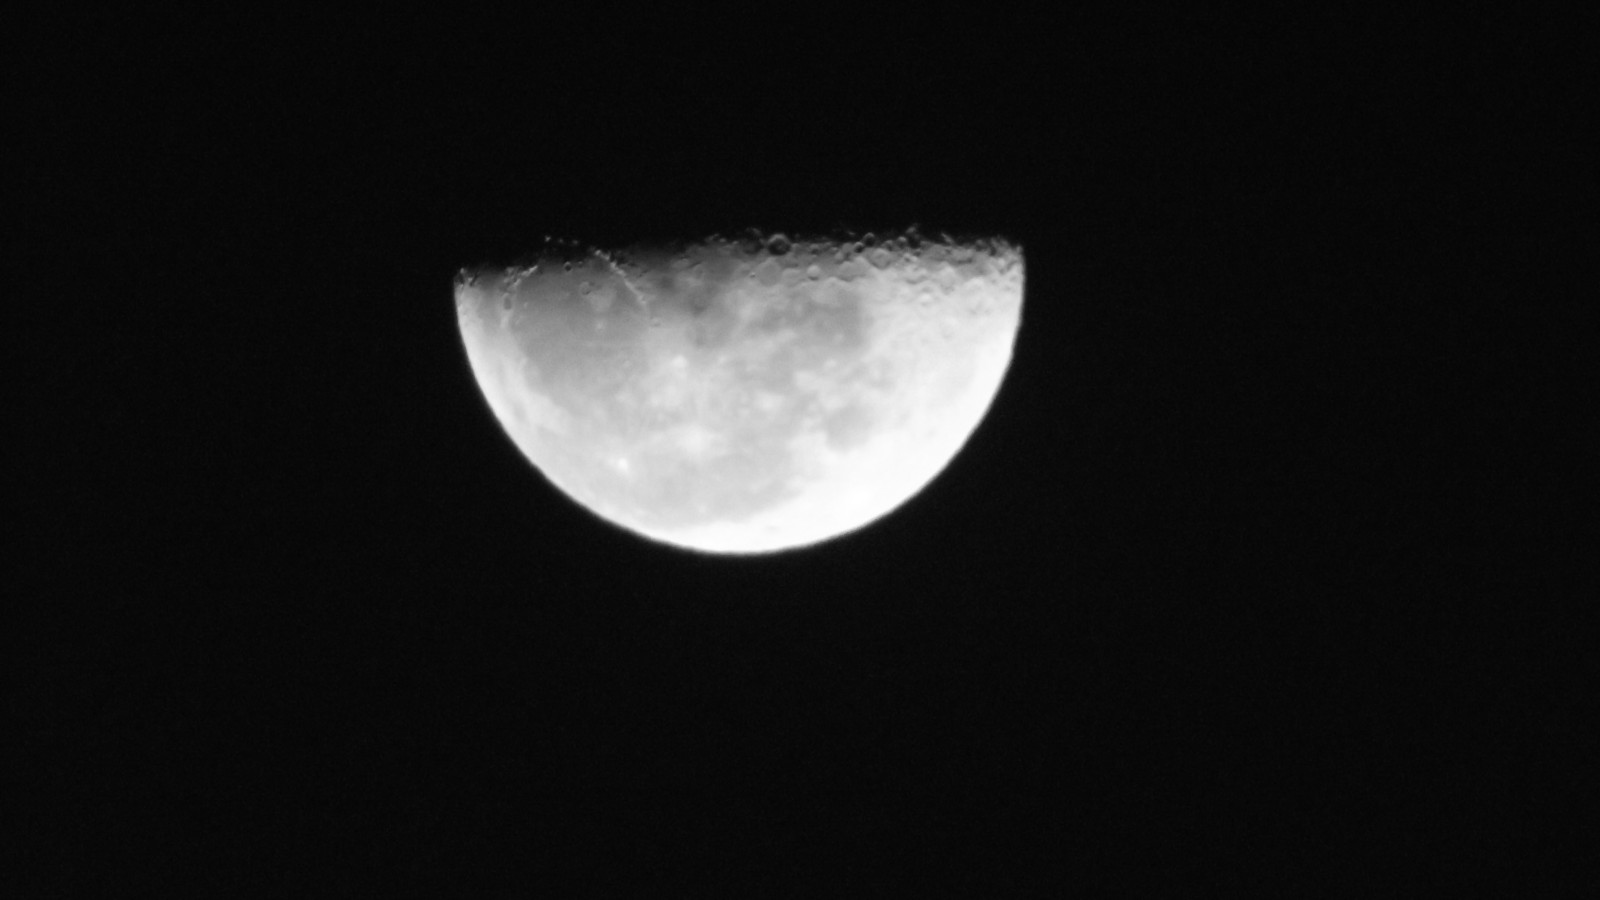 Fotos da Lua - Câmera compacta + Binóculo 10x50 25k1wys